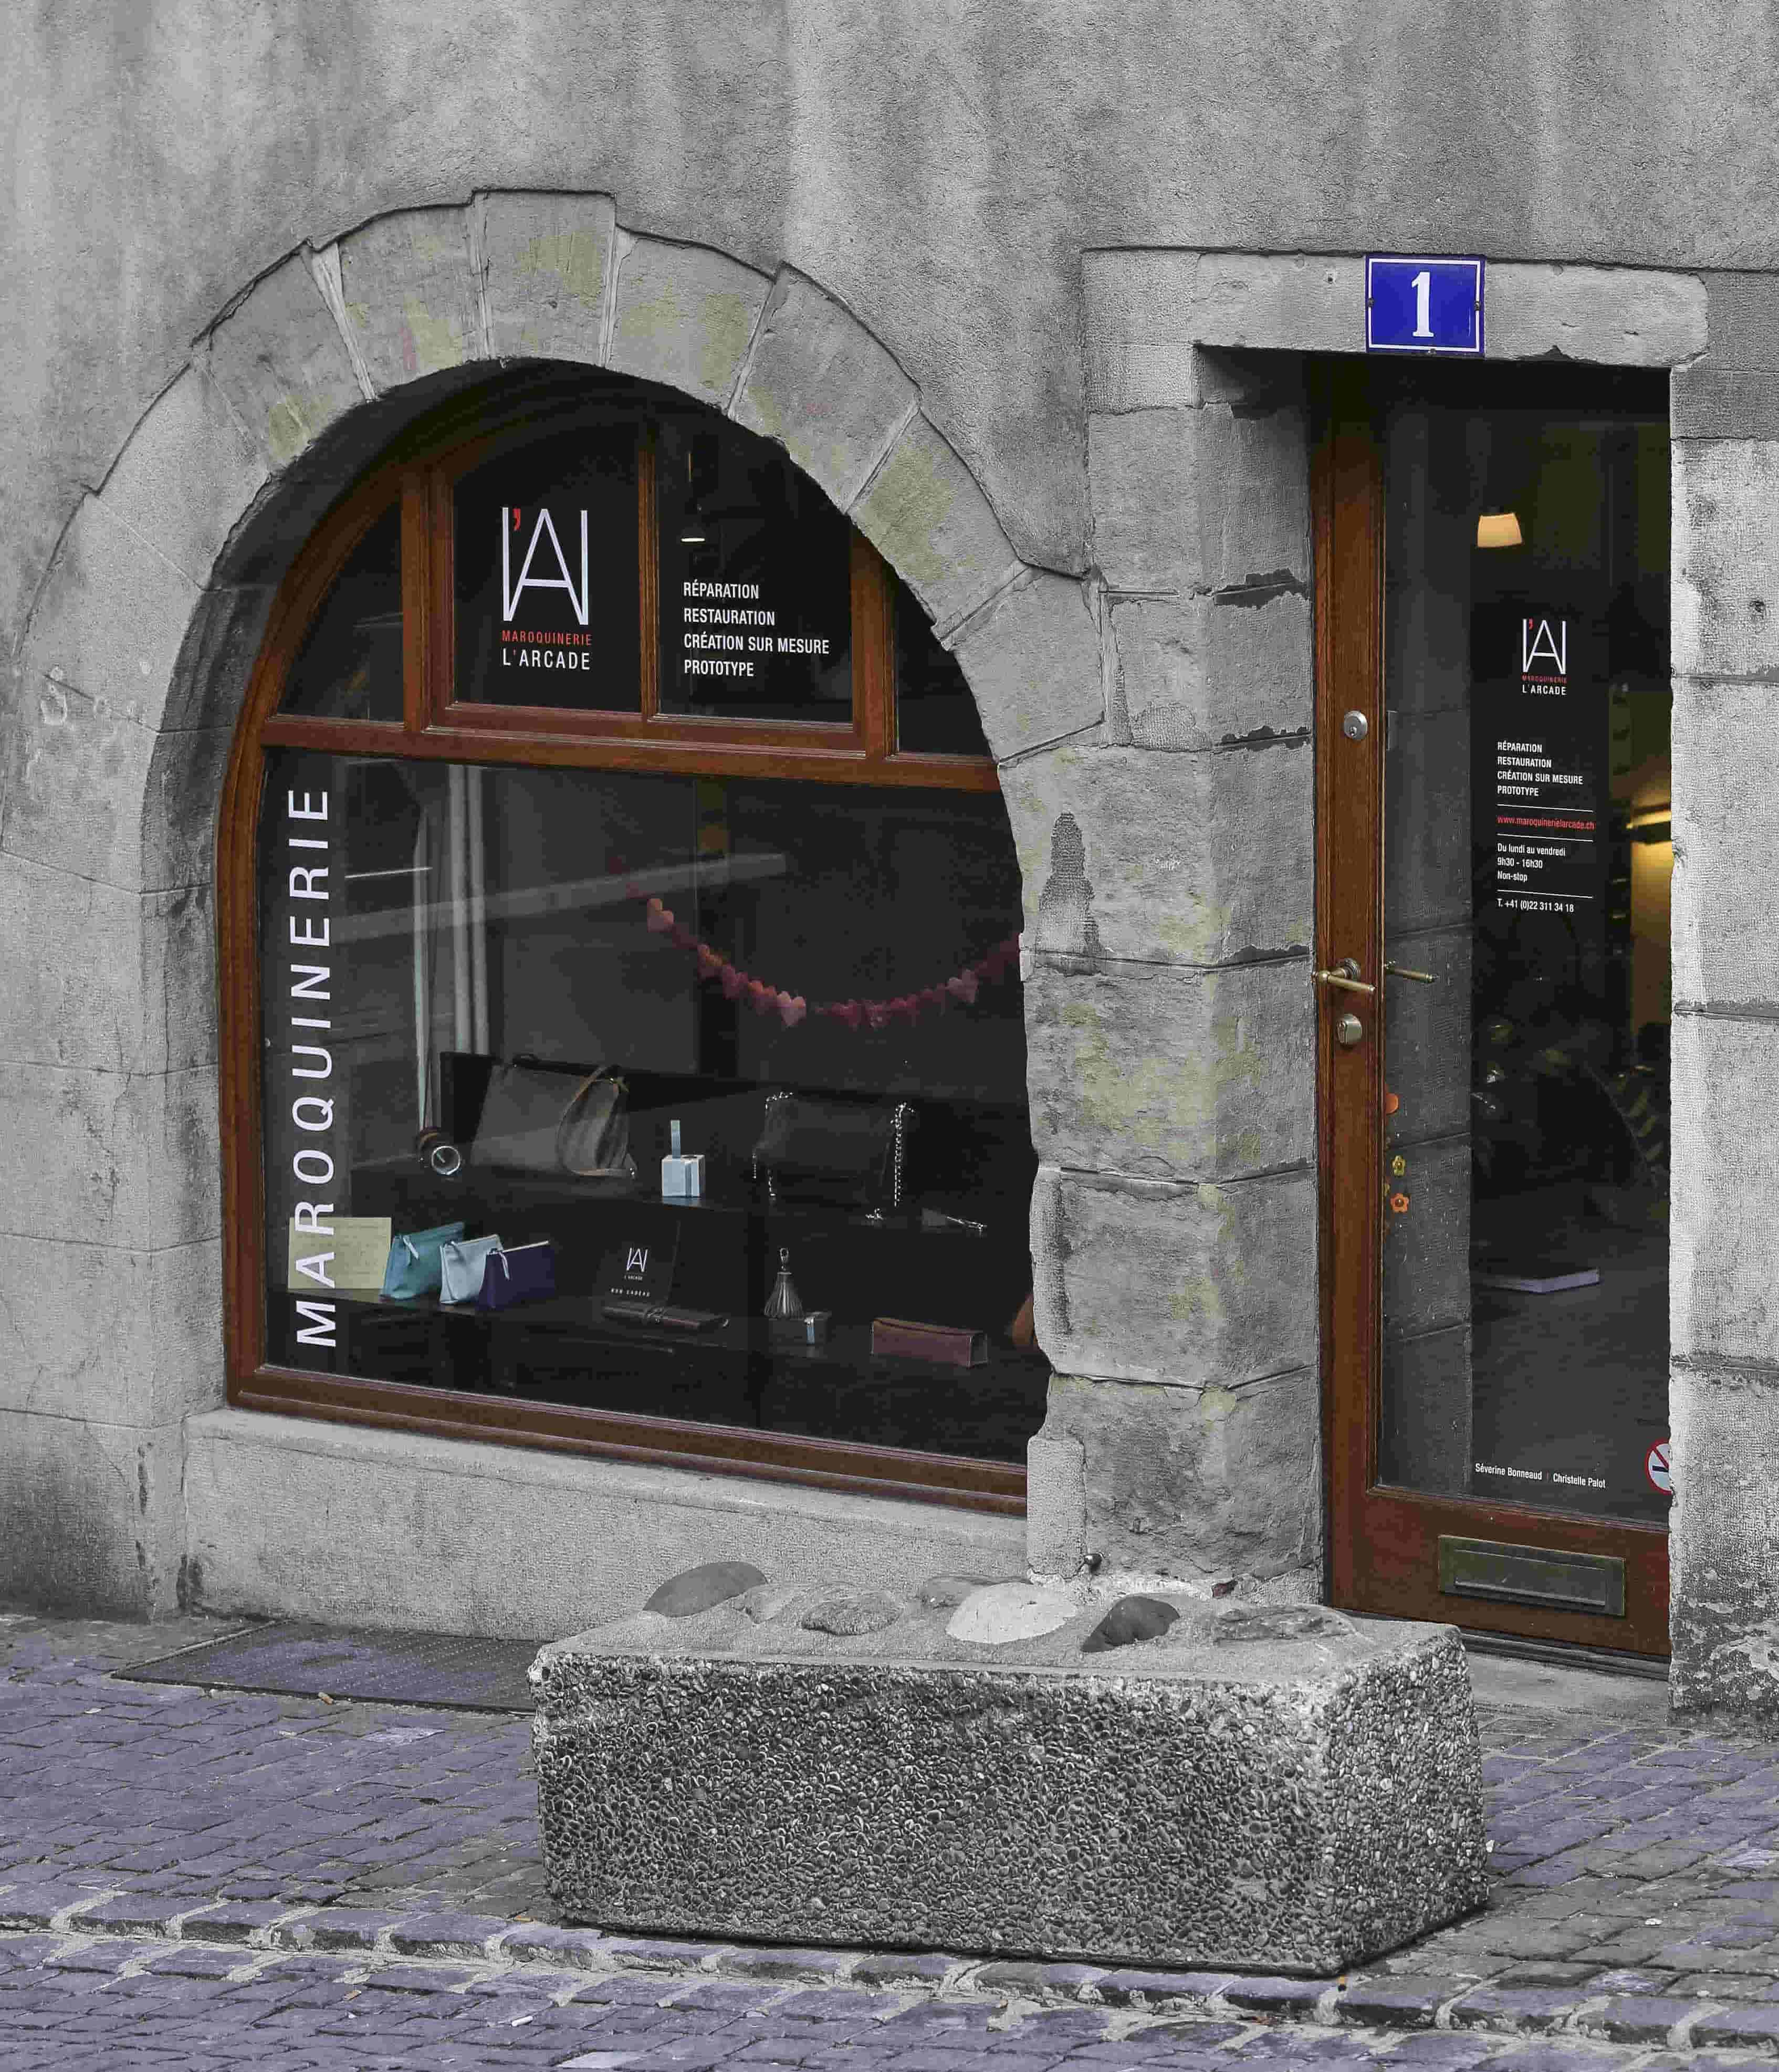 Maroquinerie-l-Arcade-Grand-Rue-1-1204-Geneve